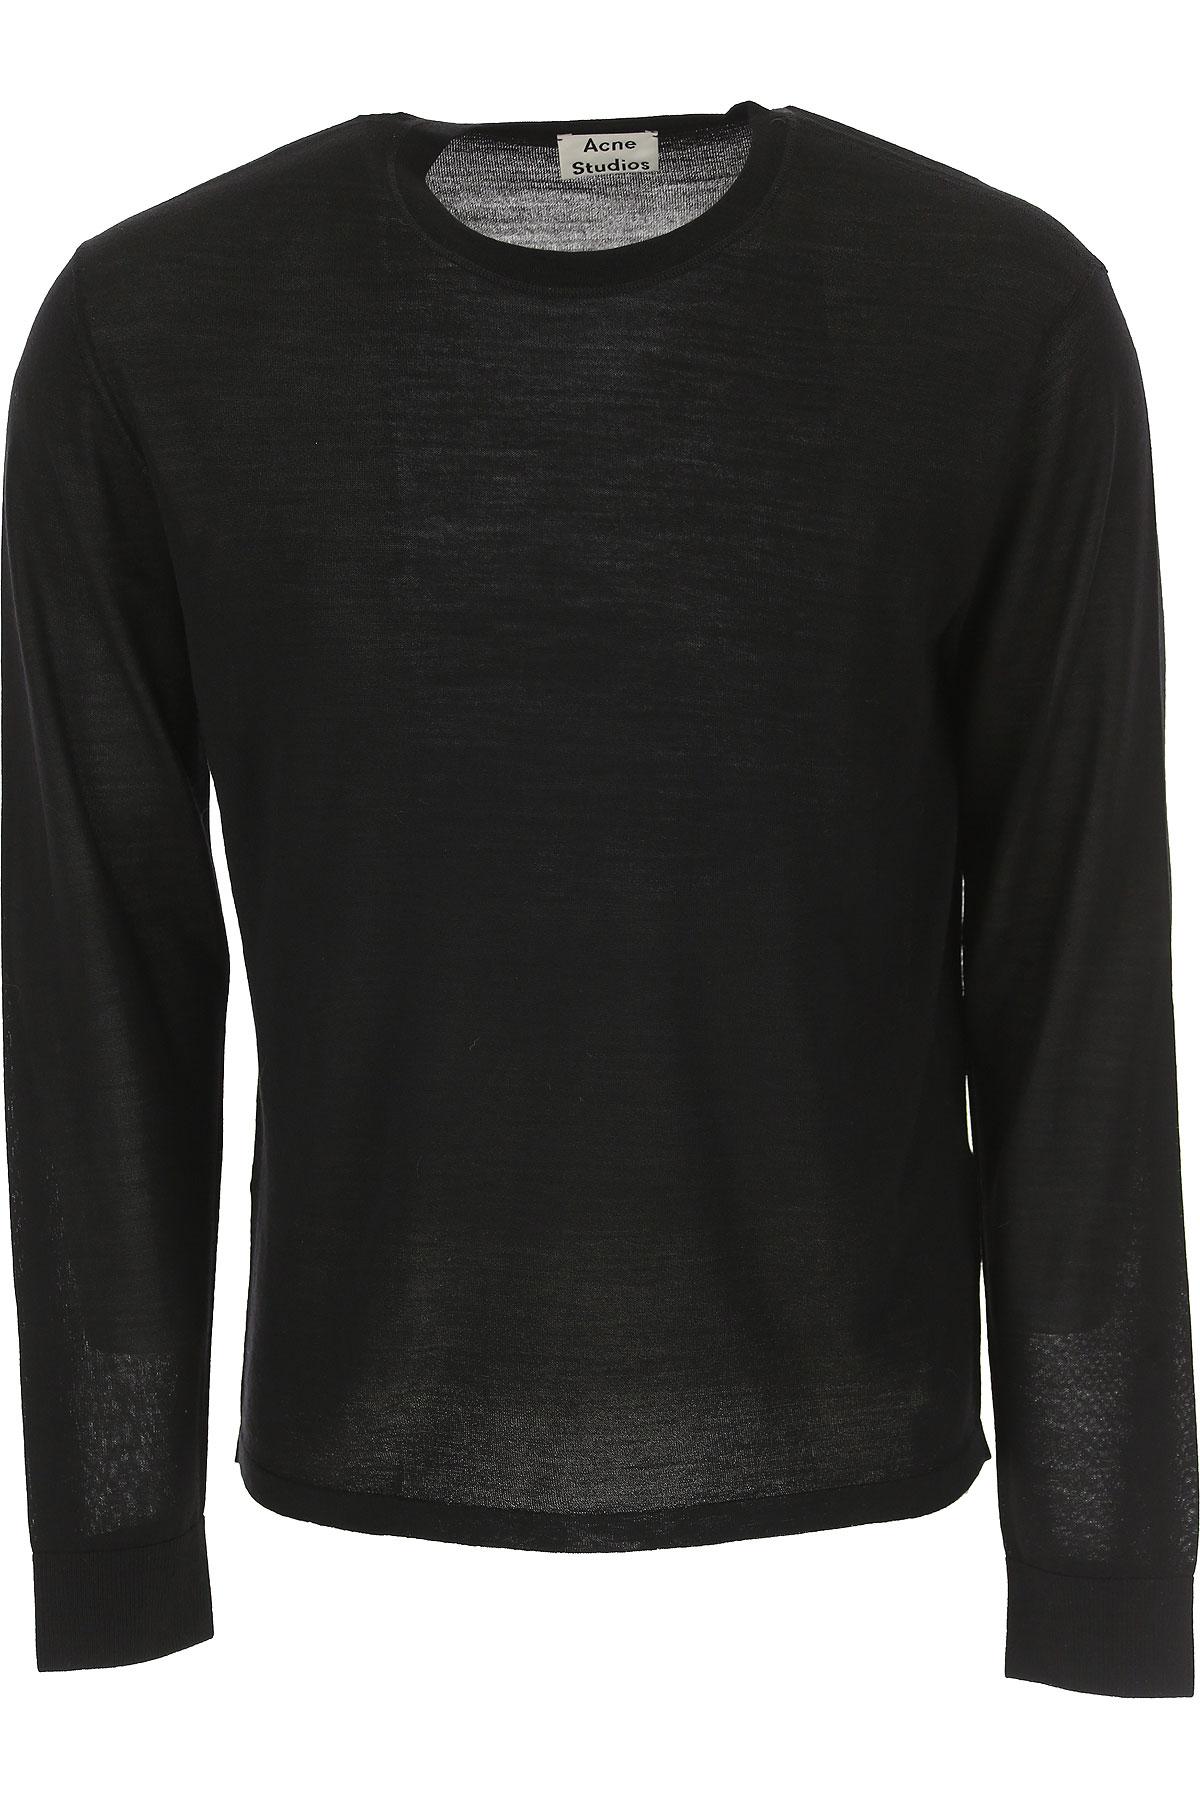 Image of Acne Studios Sweater for Men Jumper, Black, Wool, 2017, L M S XL XXL